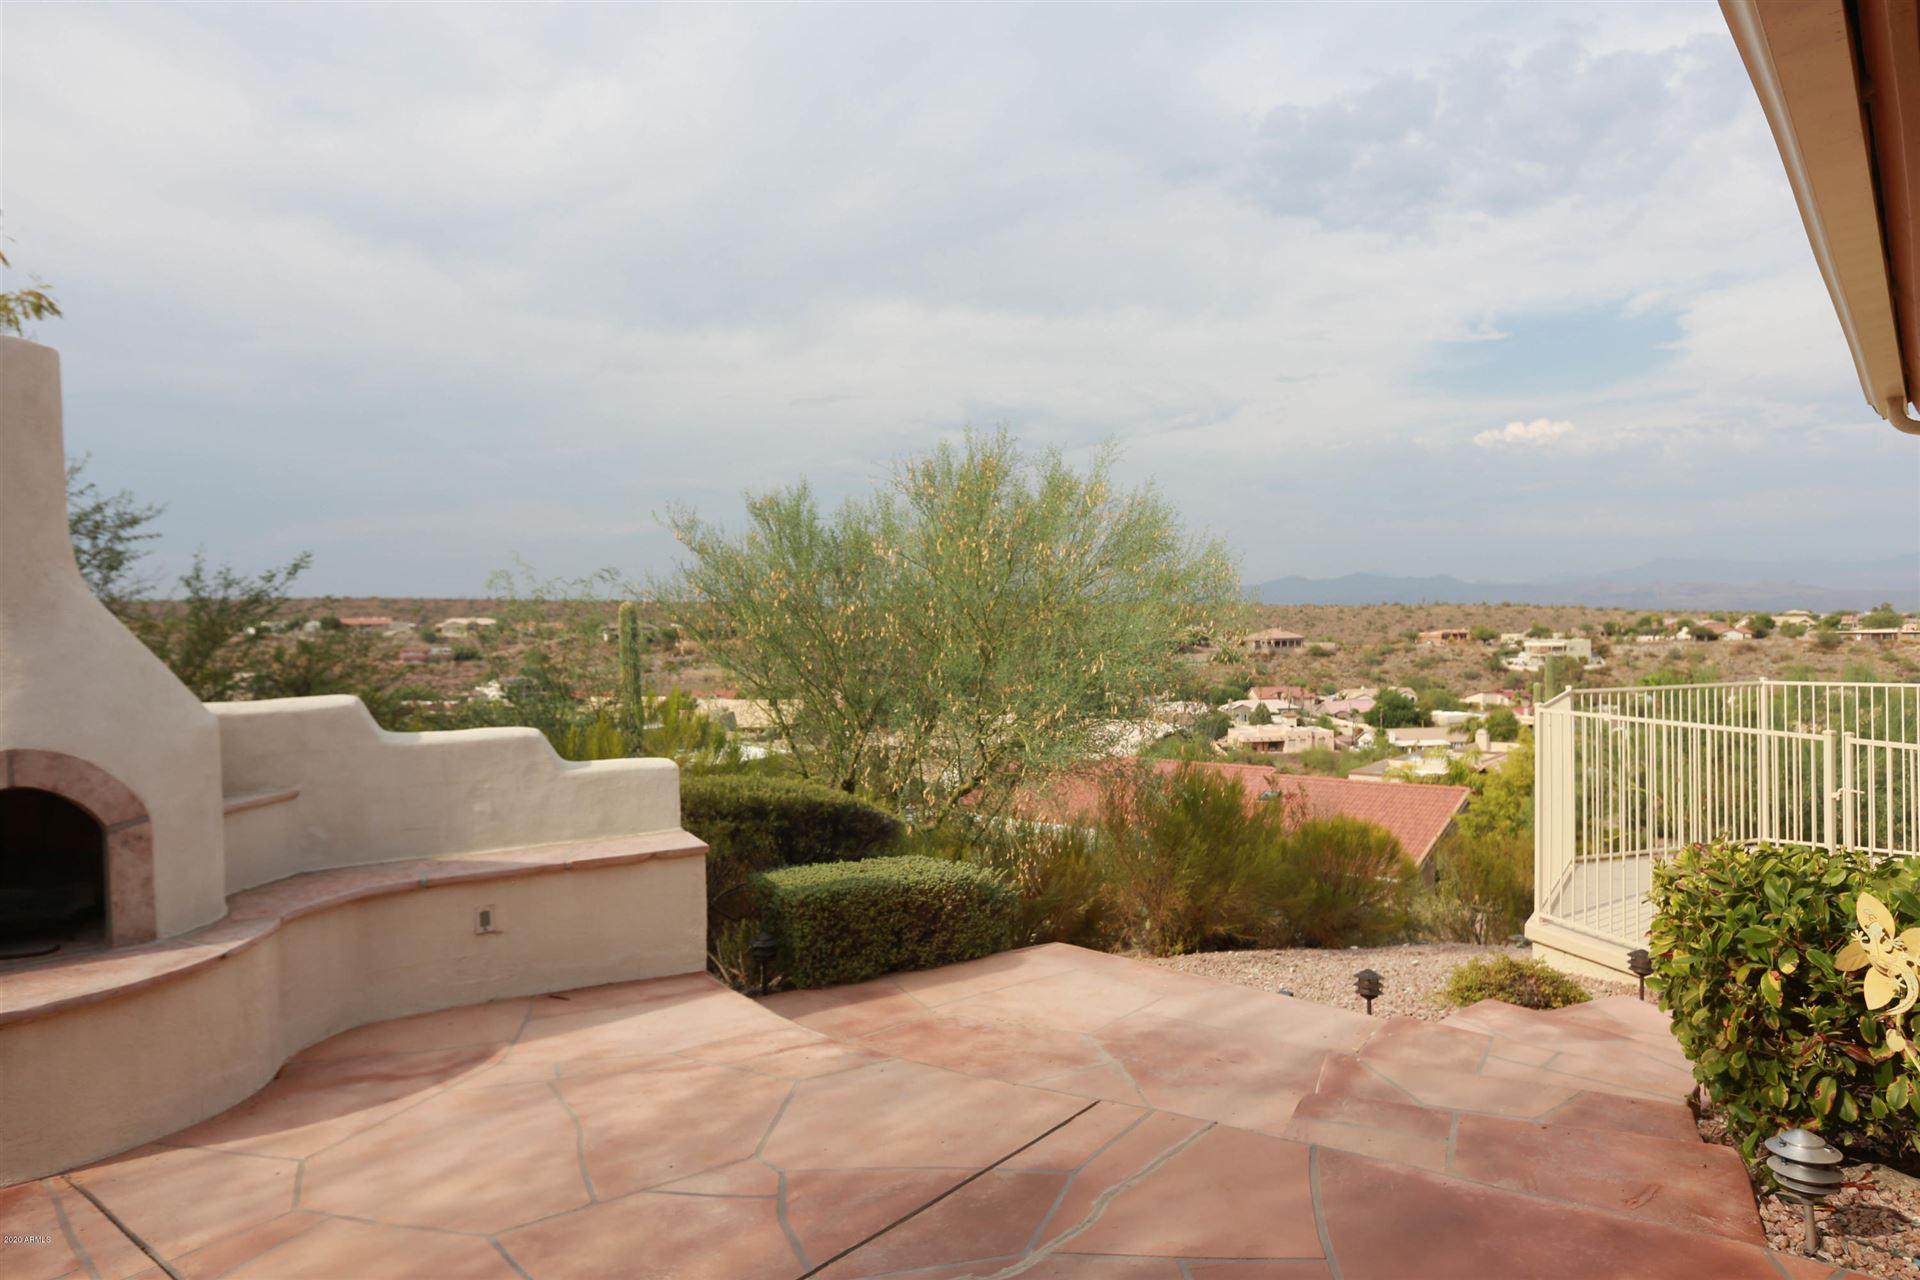 14950 E GOLDEN EAGLE Boulevard, Fountain Hills, AZ 85268 - MLS#: 6119522